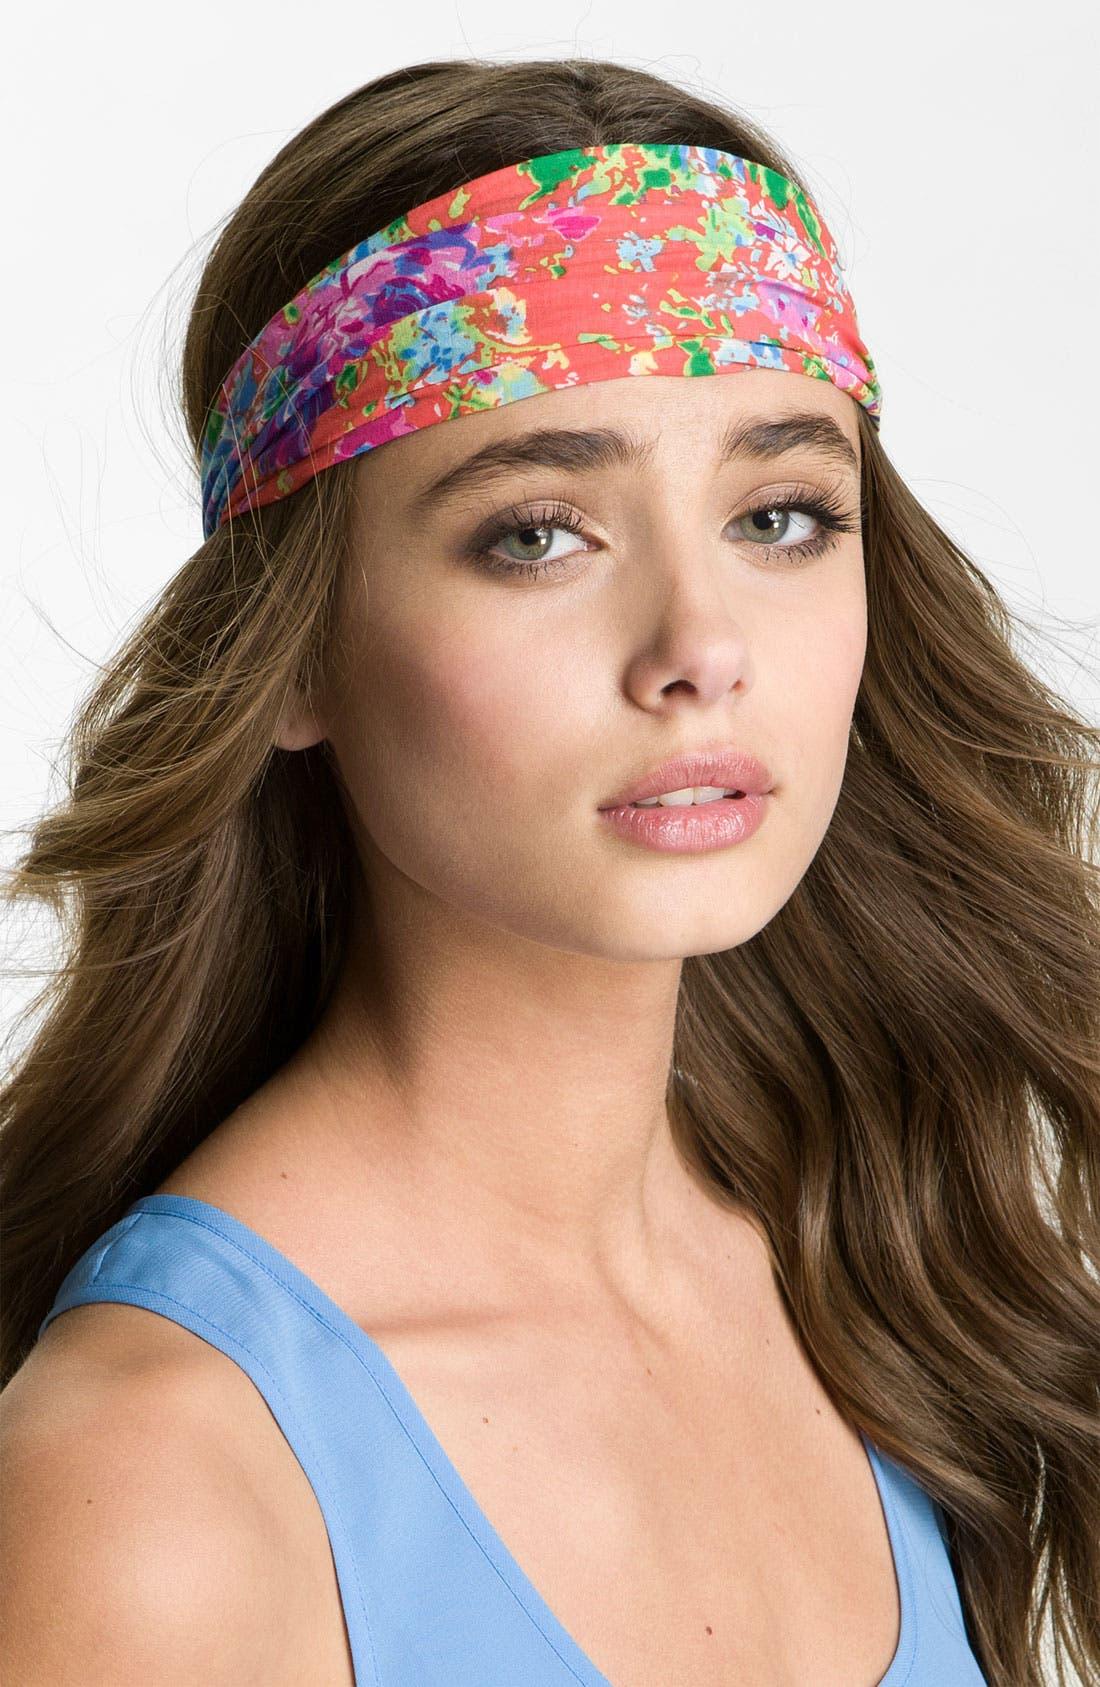 Main Image - Capelli of New York Floral Headband